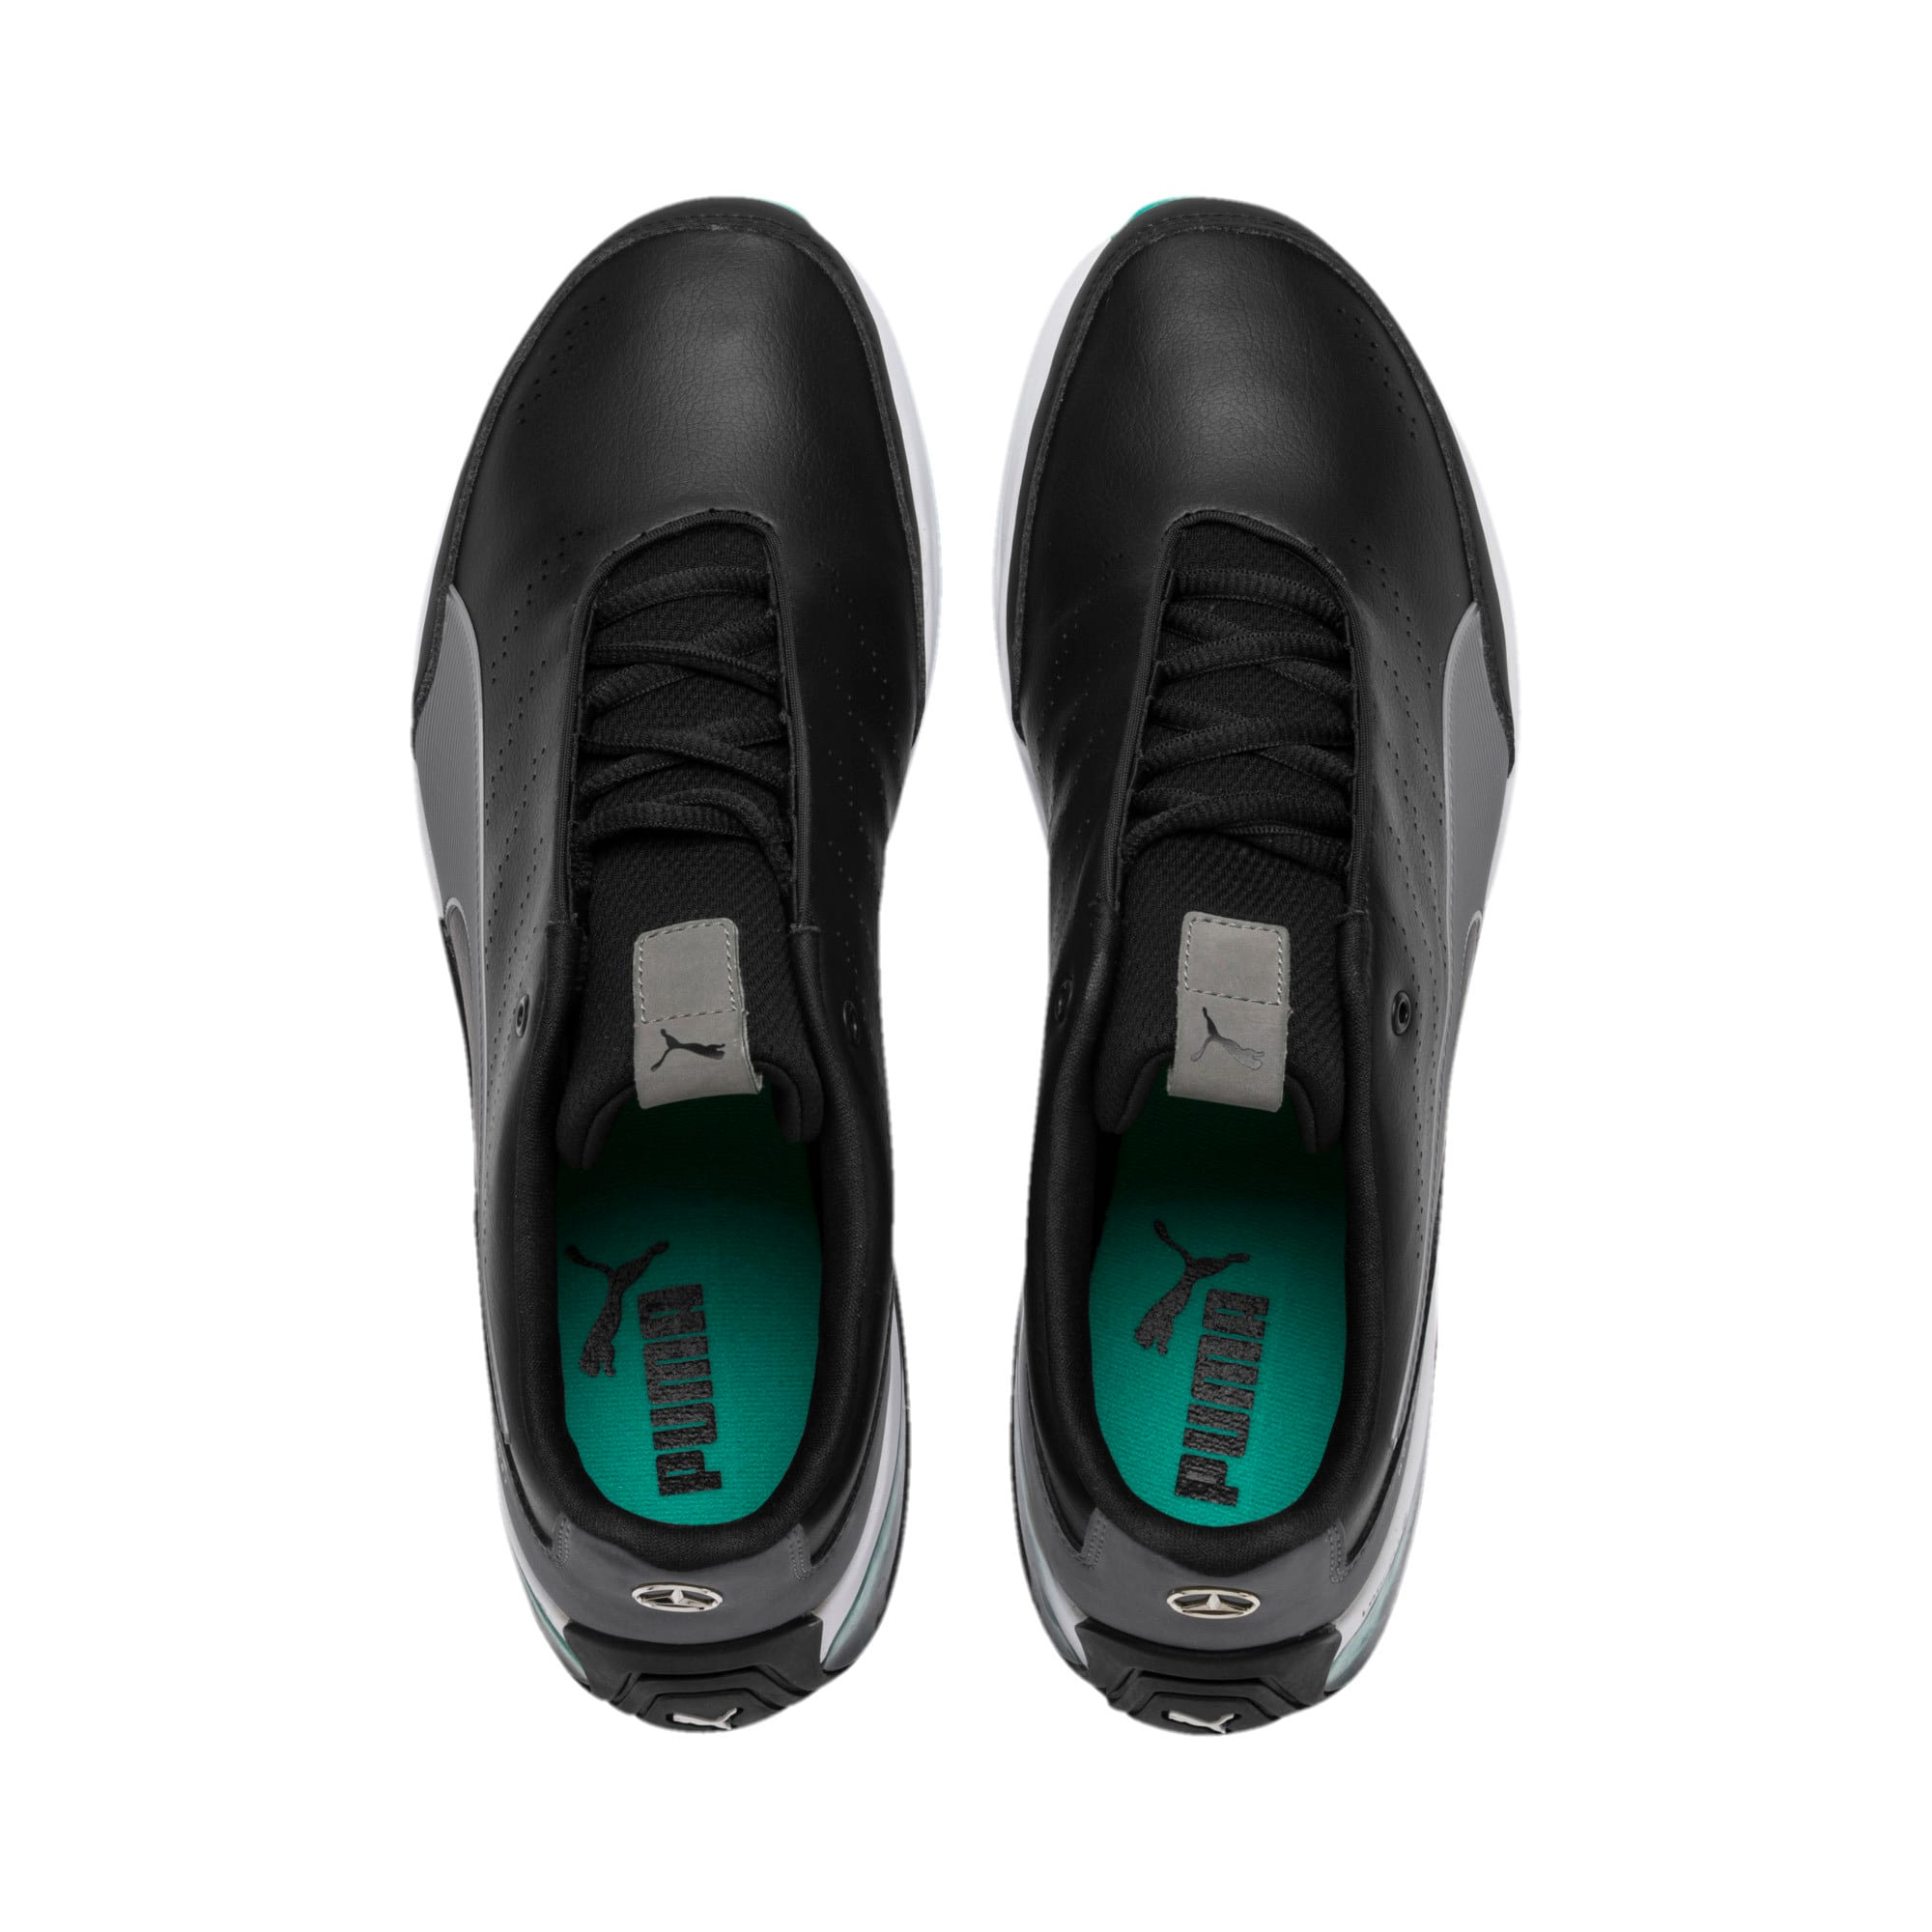 Thumbnail 7 of Mercedes AMG Petronas Kart Cat X Men's Training Shoes, Puma Black-Smoked Pearl, medium